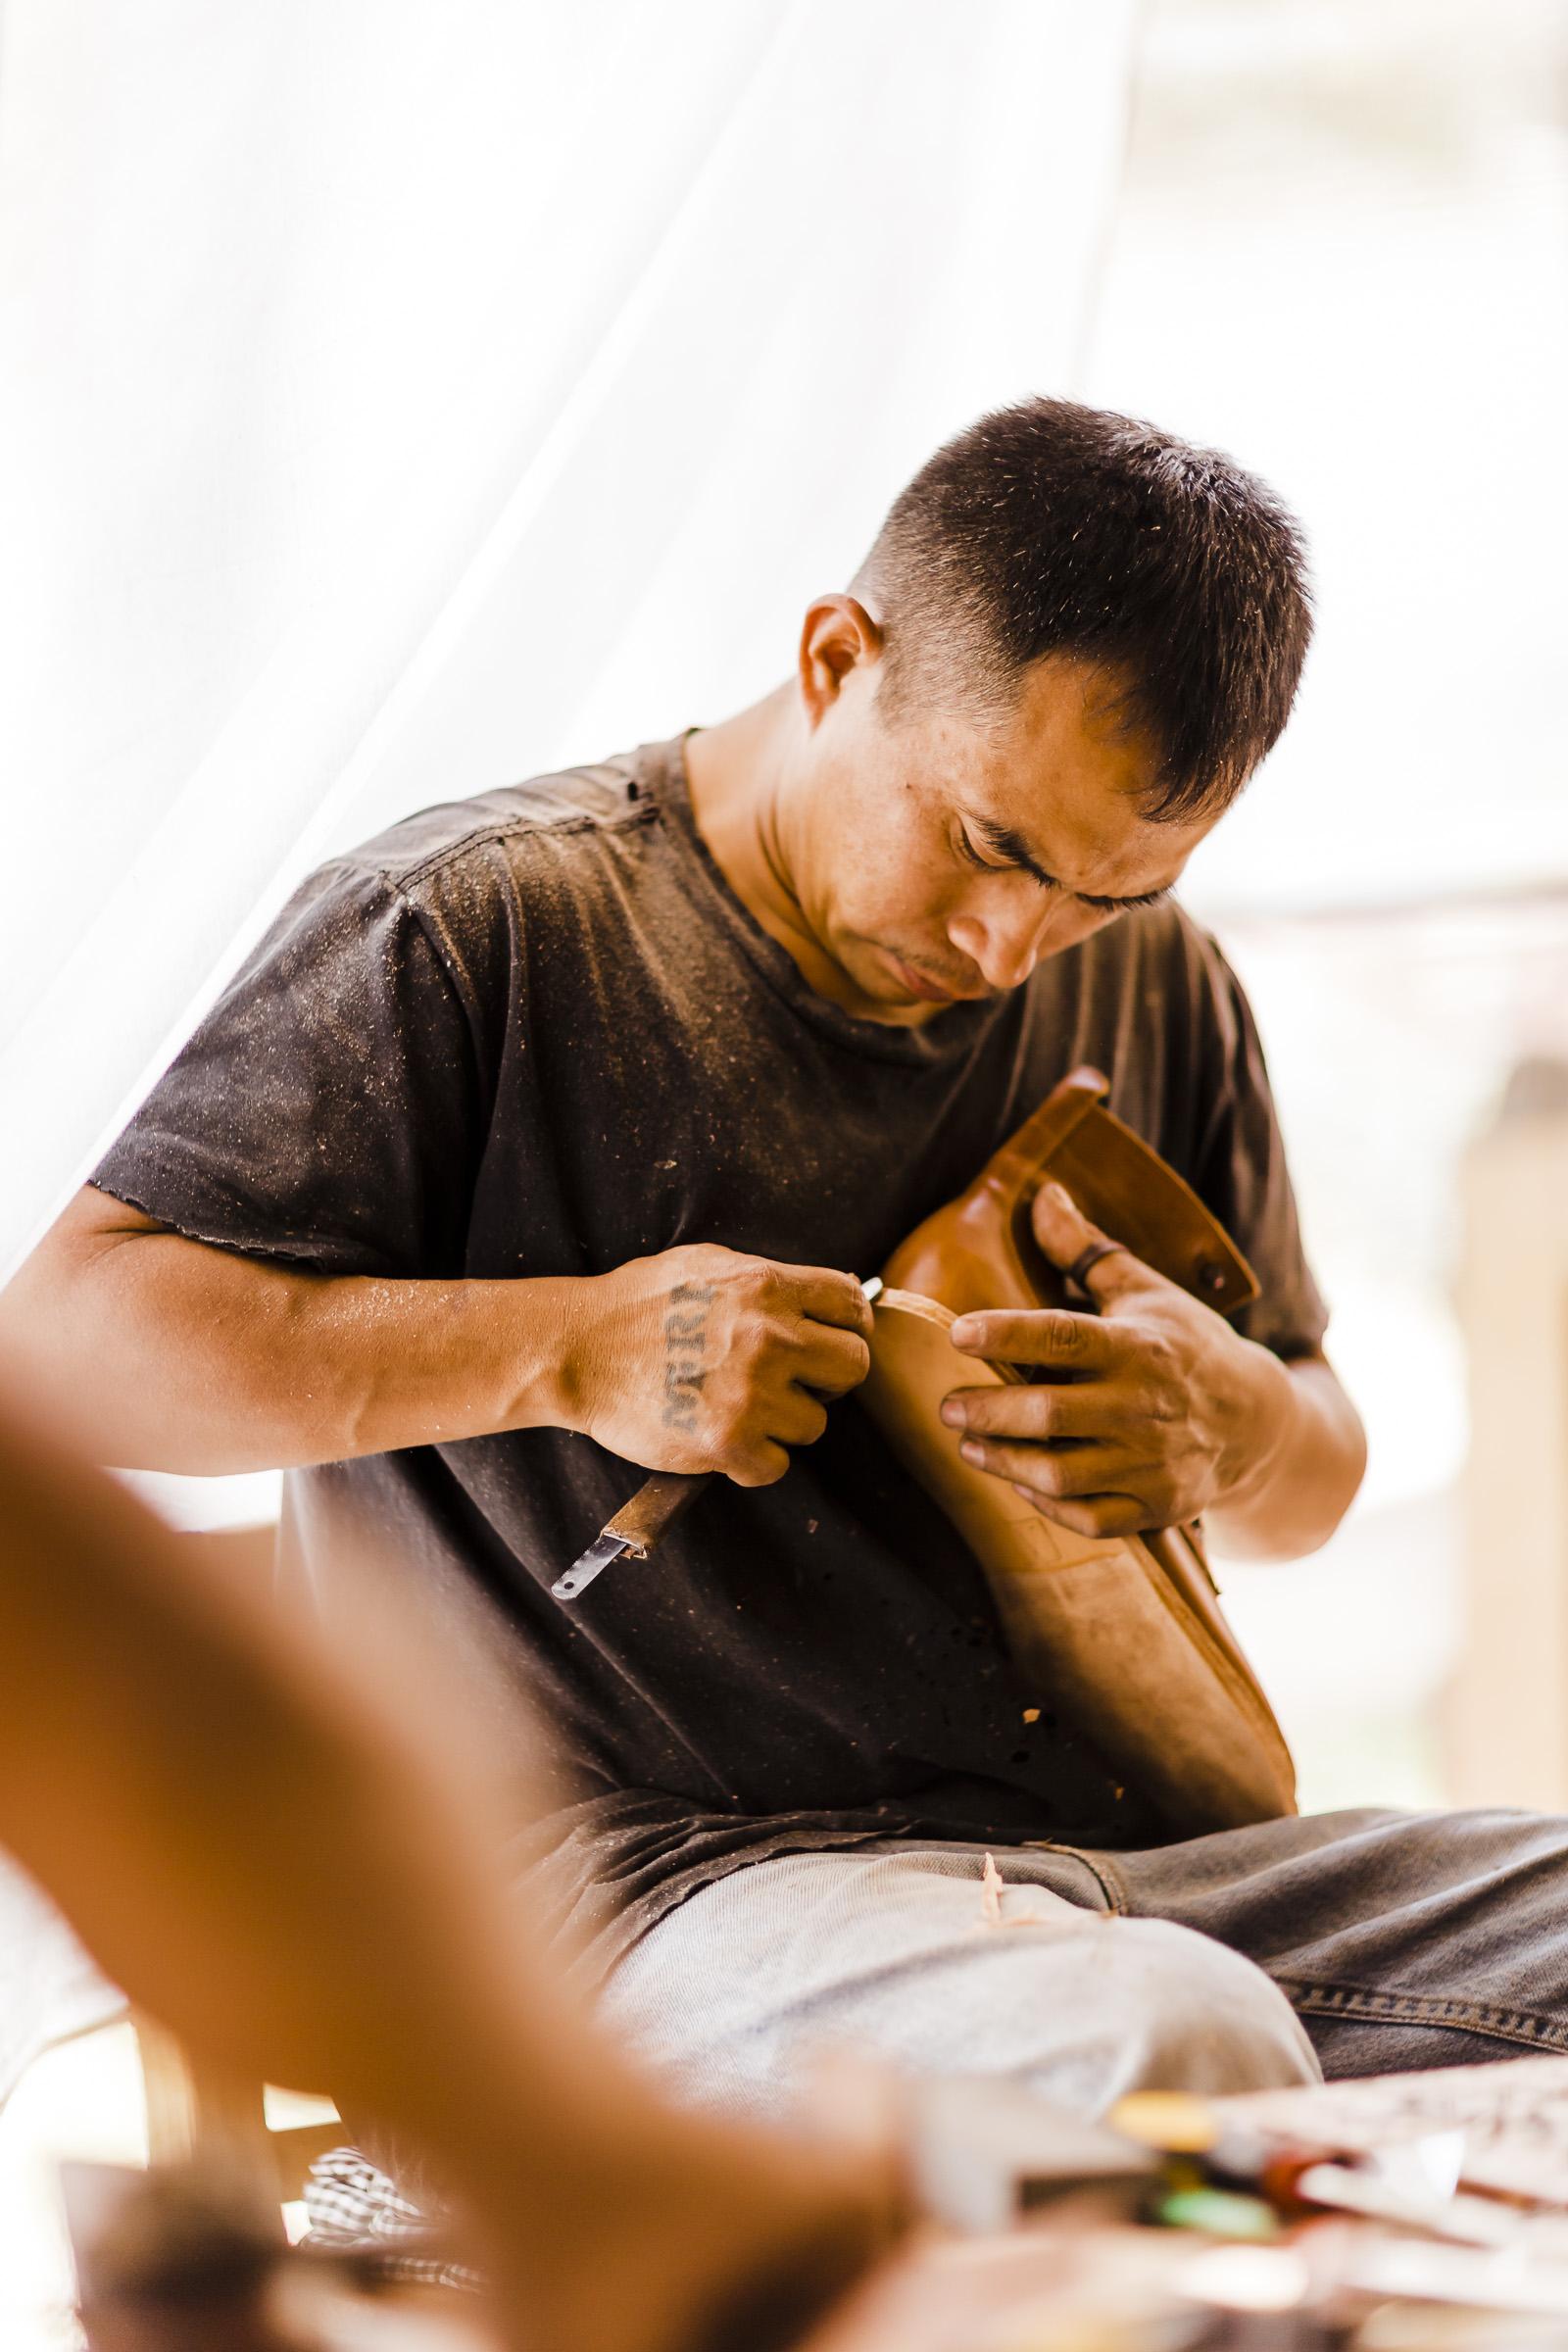 Stories - Shoemakers from Gautemala